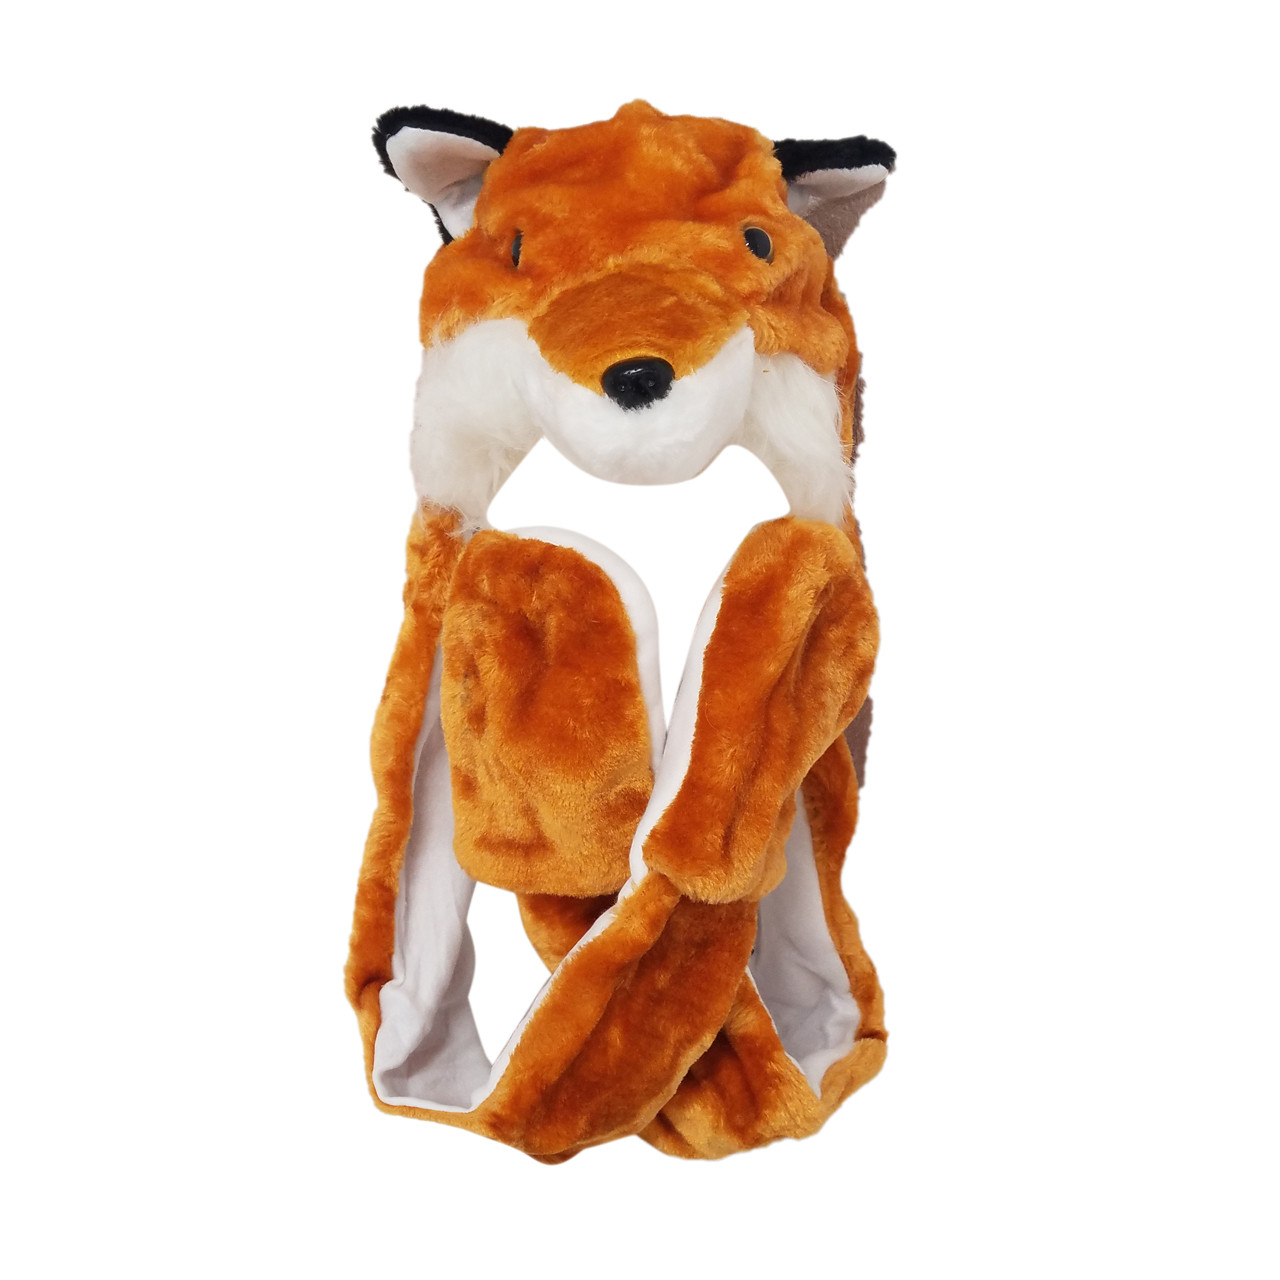 18a758464f4 Fox animal hat a long arms with mittens wholesale llc jpg 1280x1280 Fox  animal hat